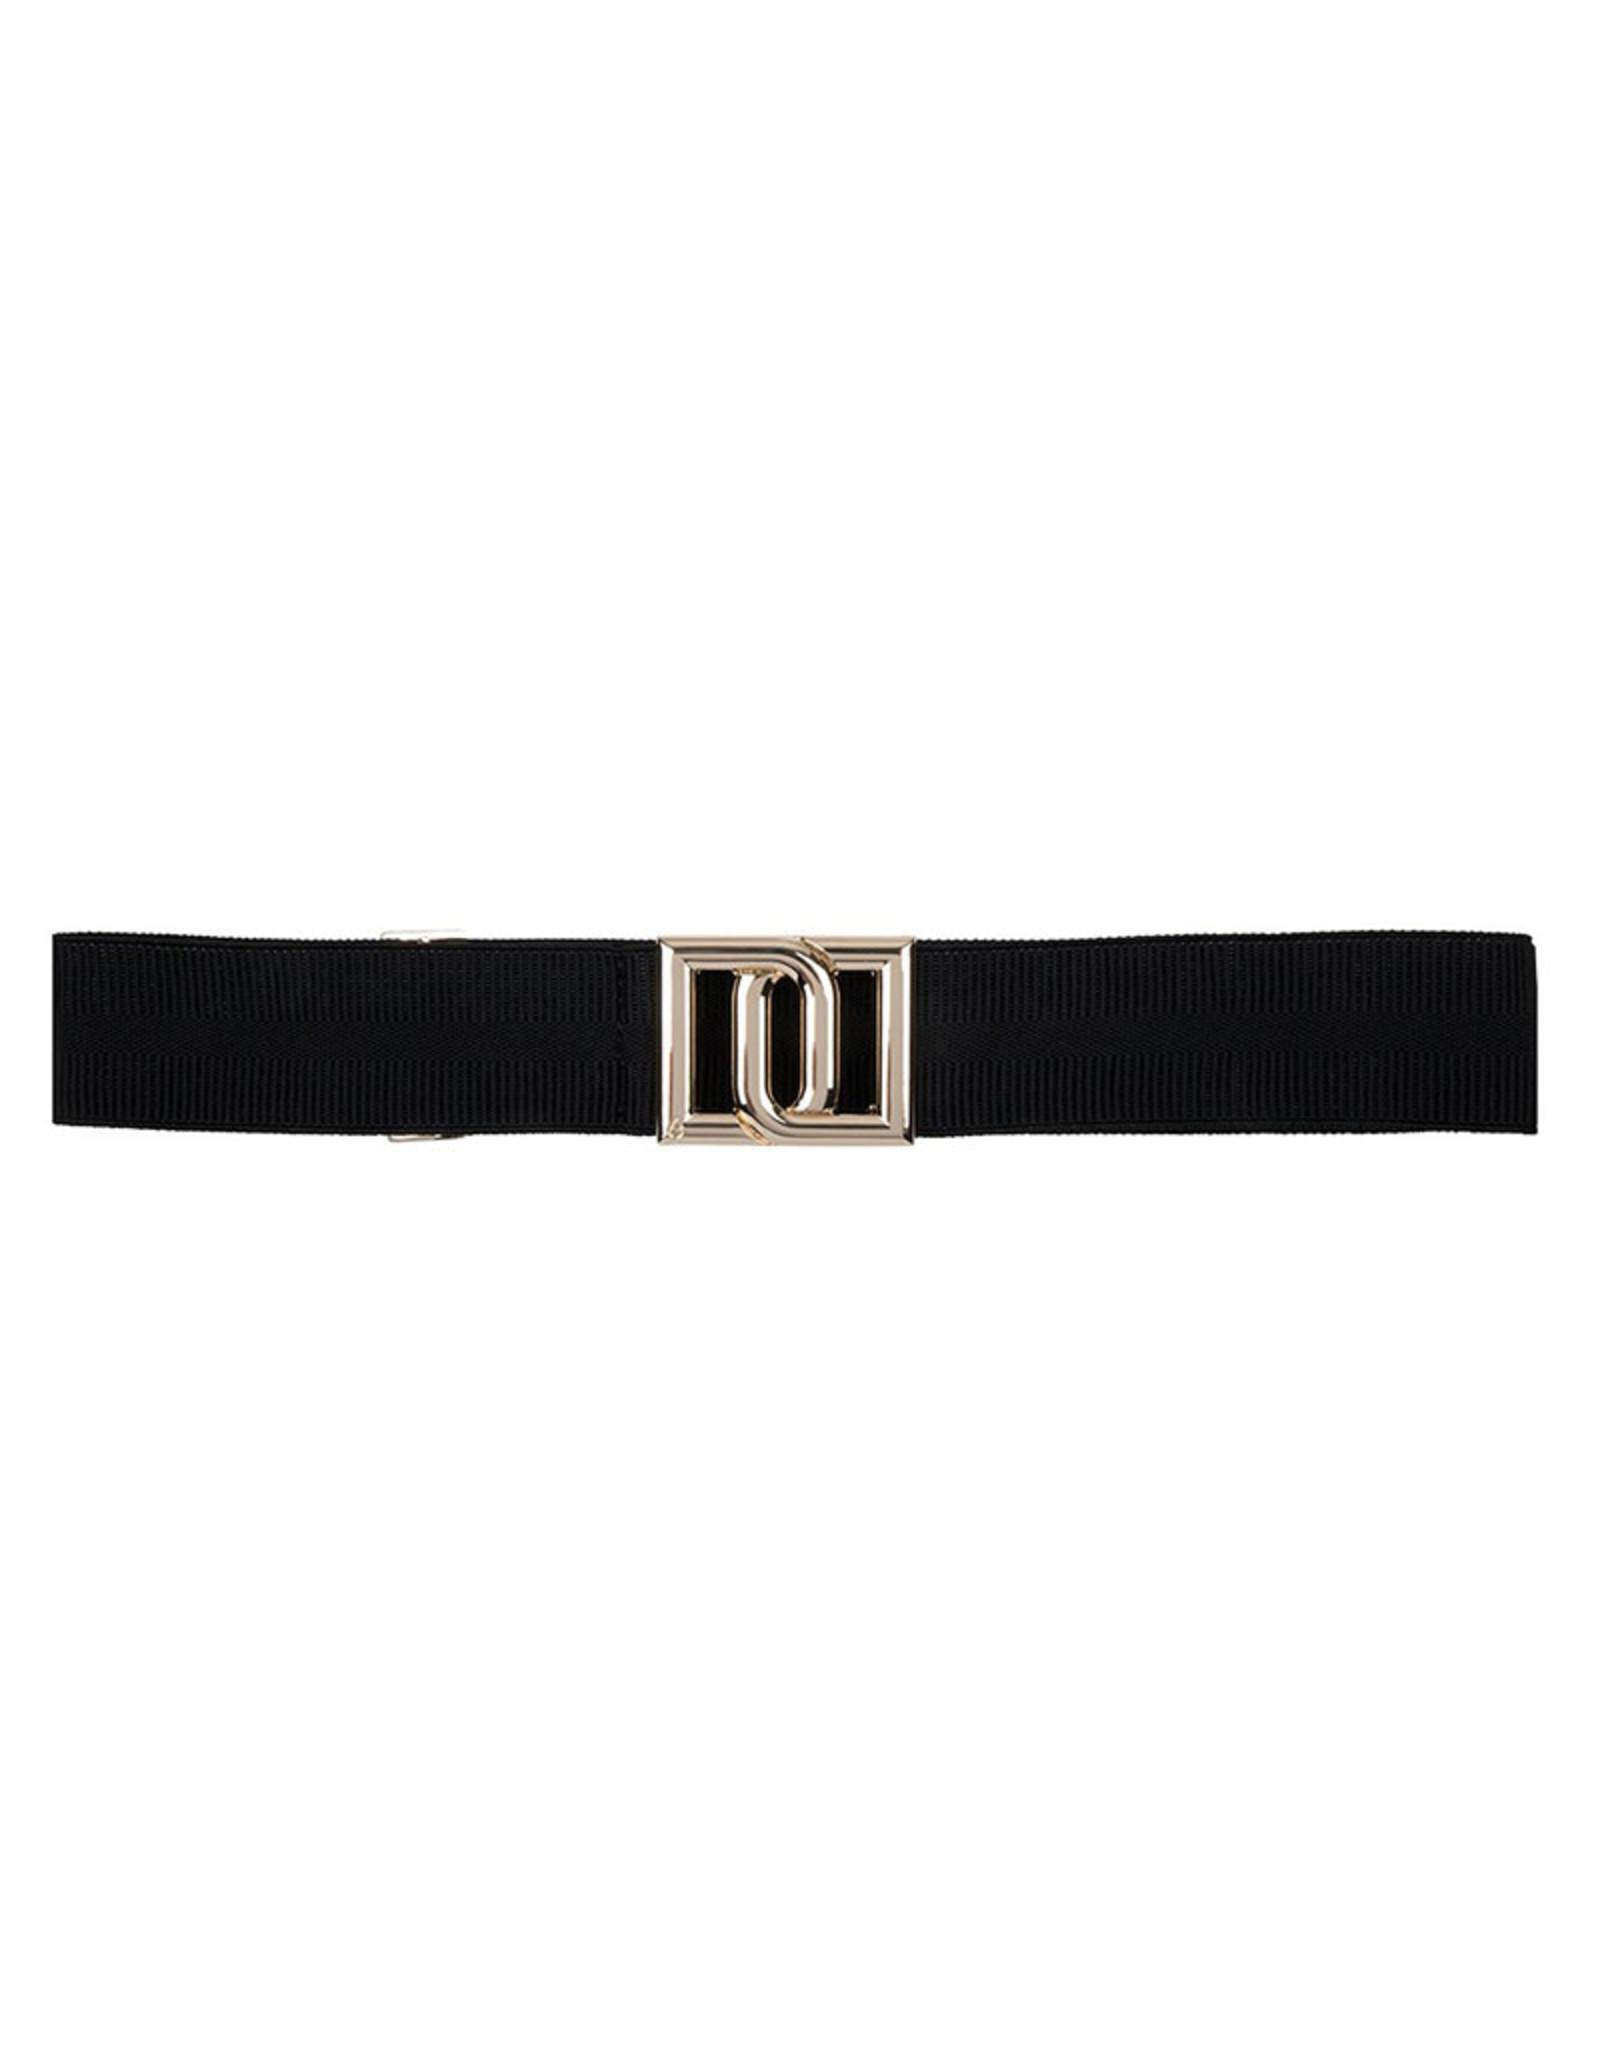 dante6 Monogram Belt